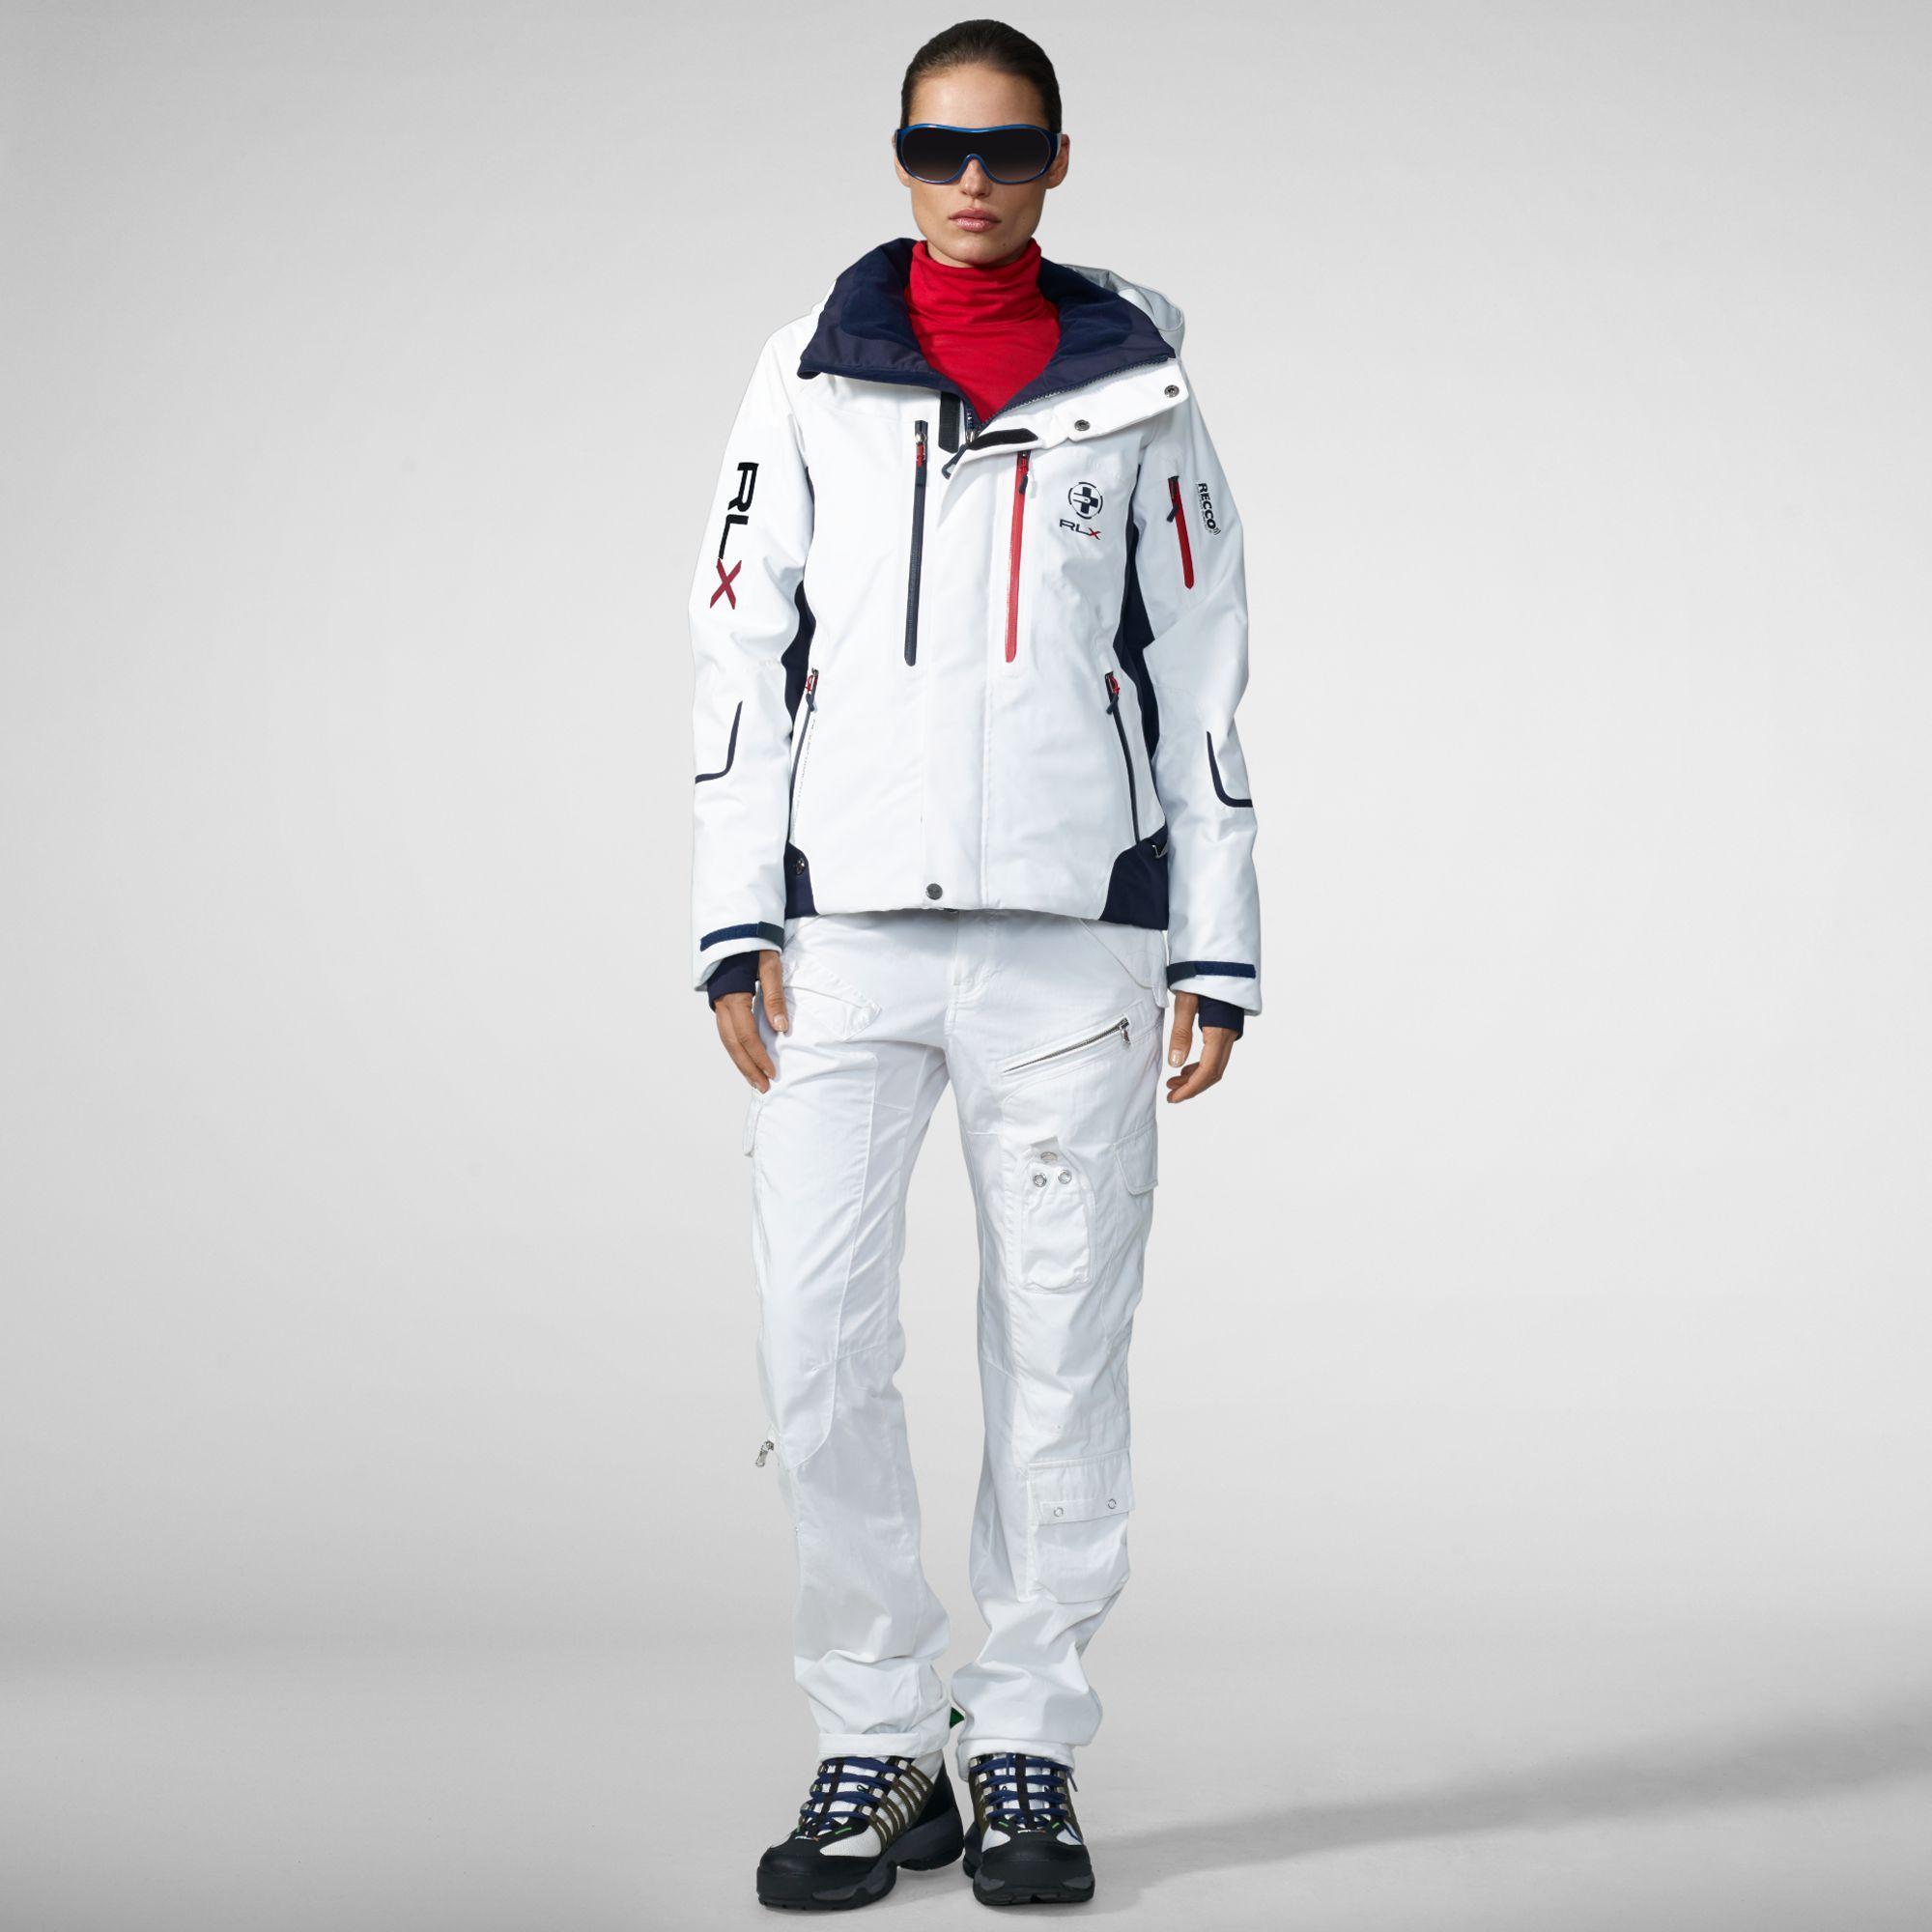 795a173955 Ralph Lauren White Vail Ski Jacket  RLX